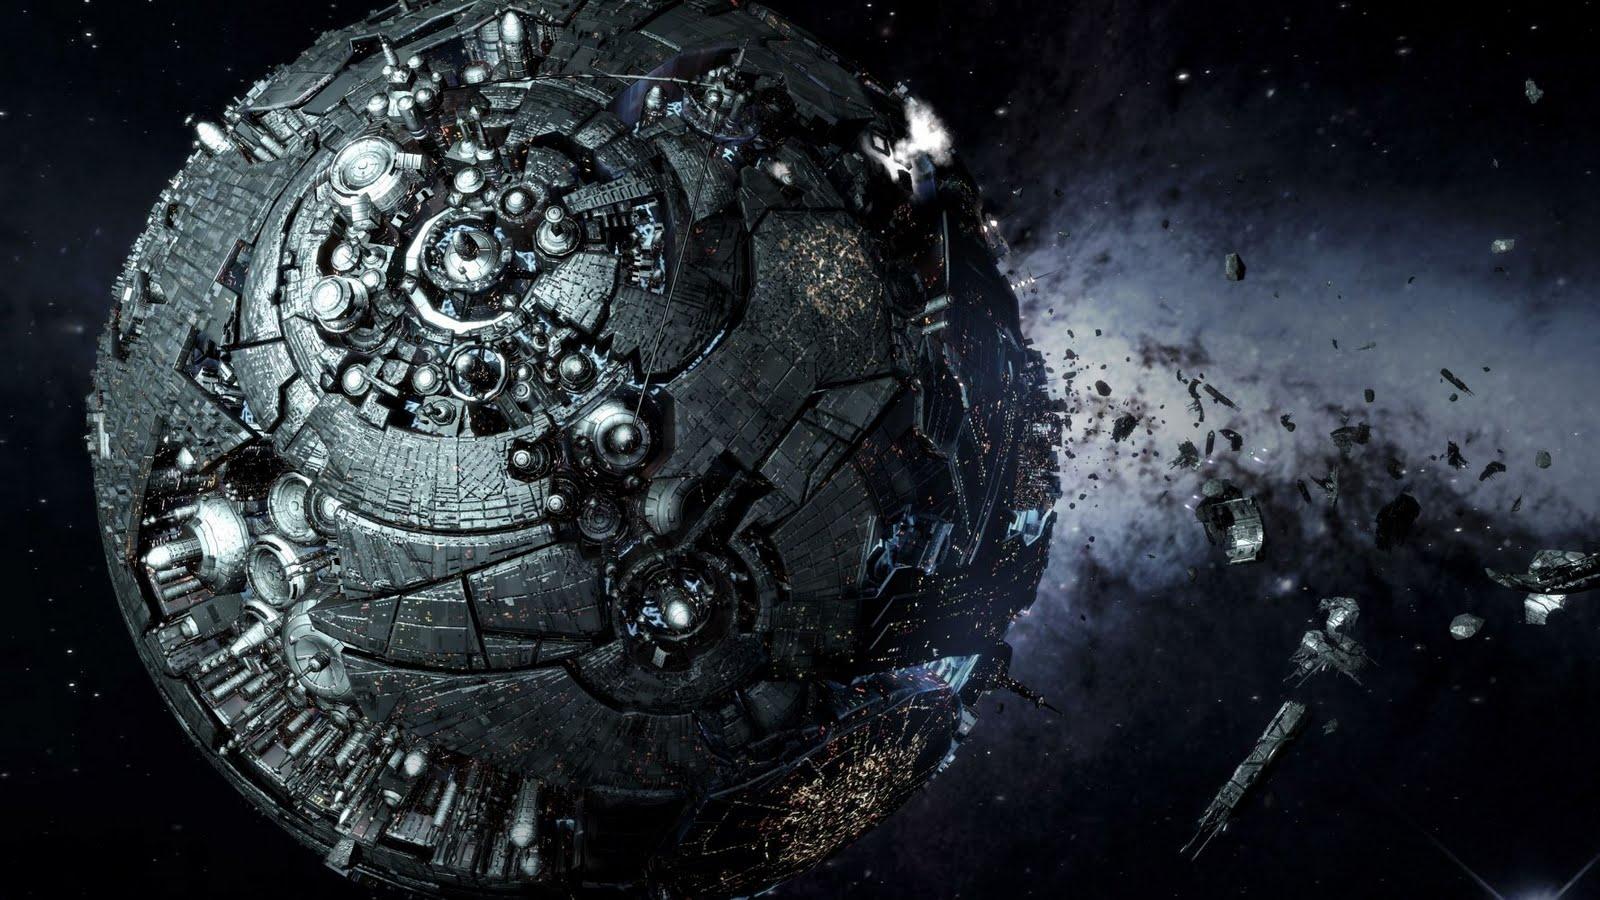 Transformers Fall Of Cybertron Hd Wallpapers 1080p Blog Testes Conhecendo O Blog